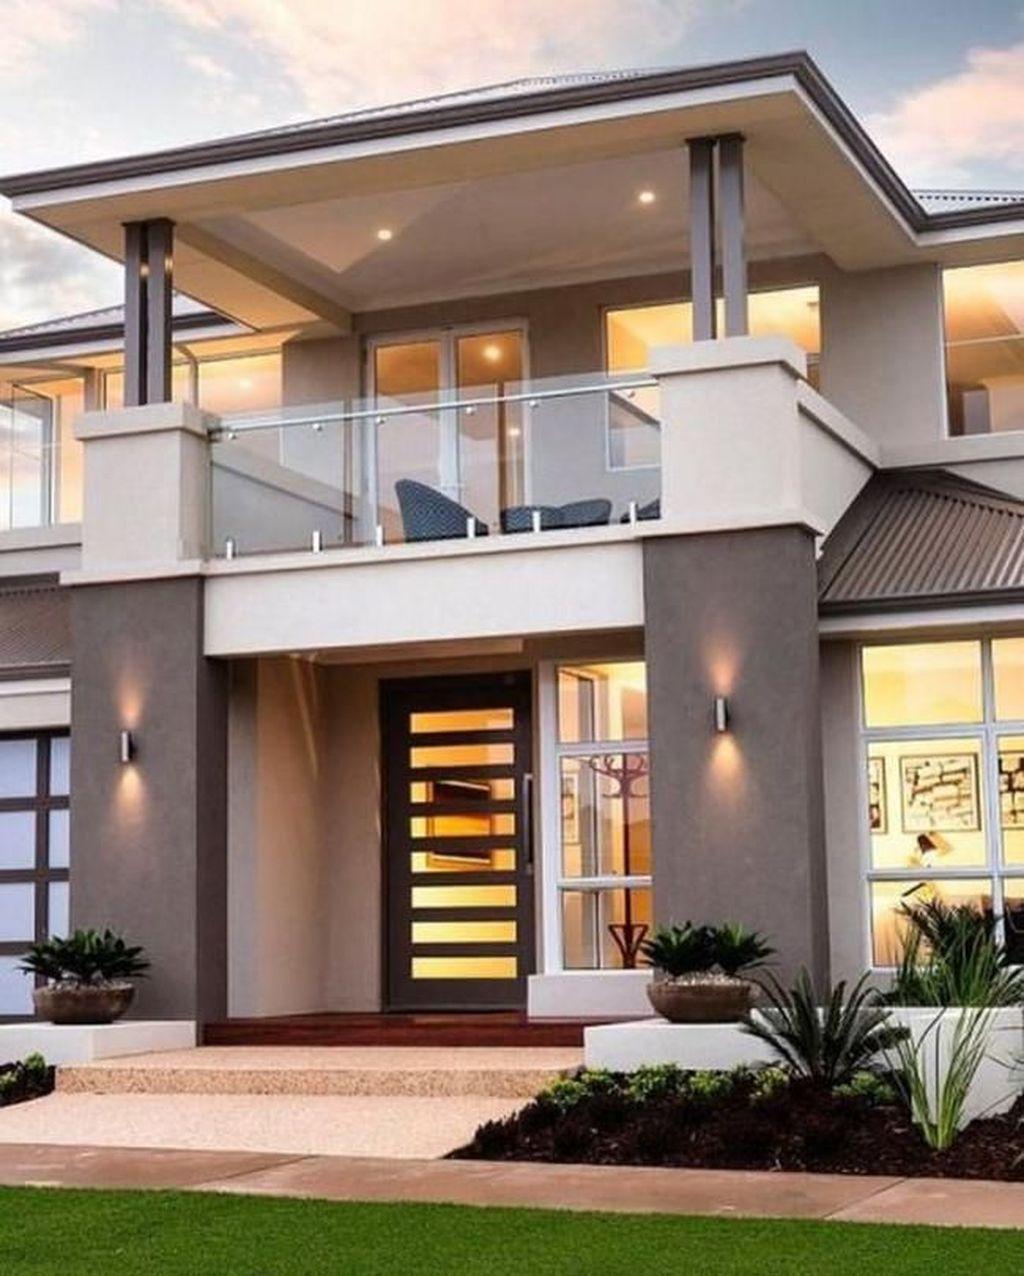 55 Cool Hallway Decor Ideas: Cool 55 Inspiring Modern Minimalist Home Decor Ideas On A